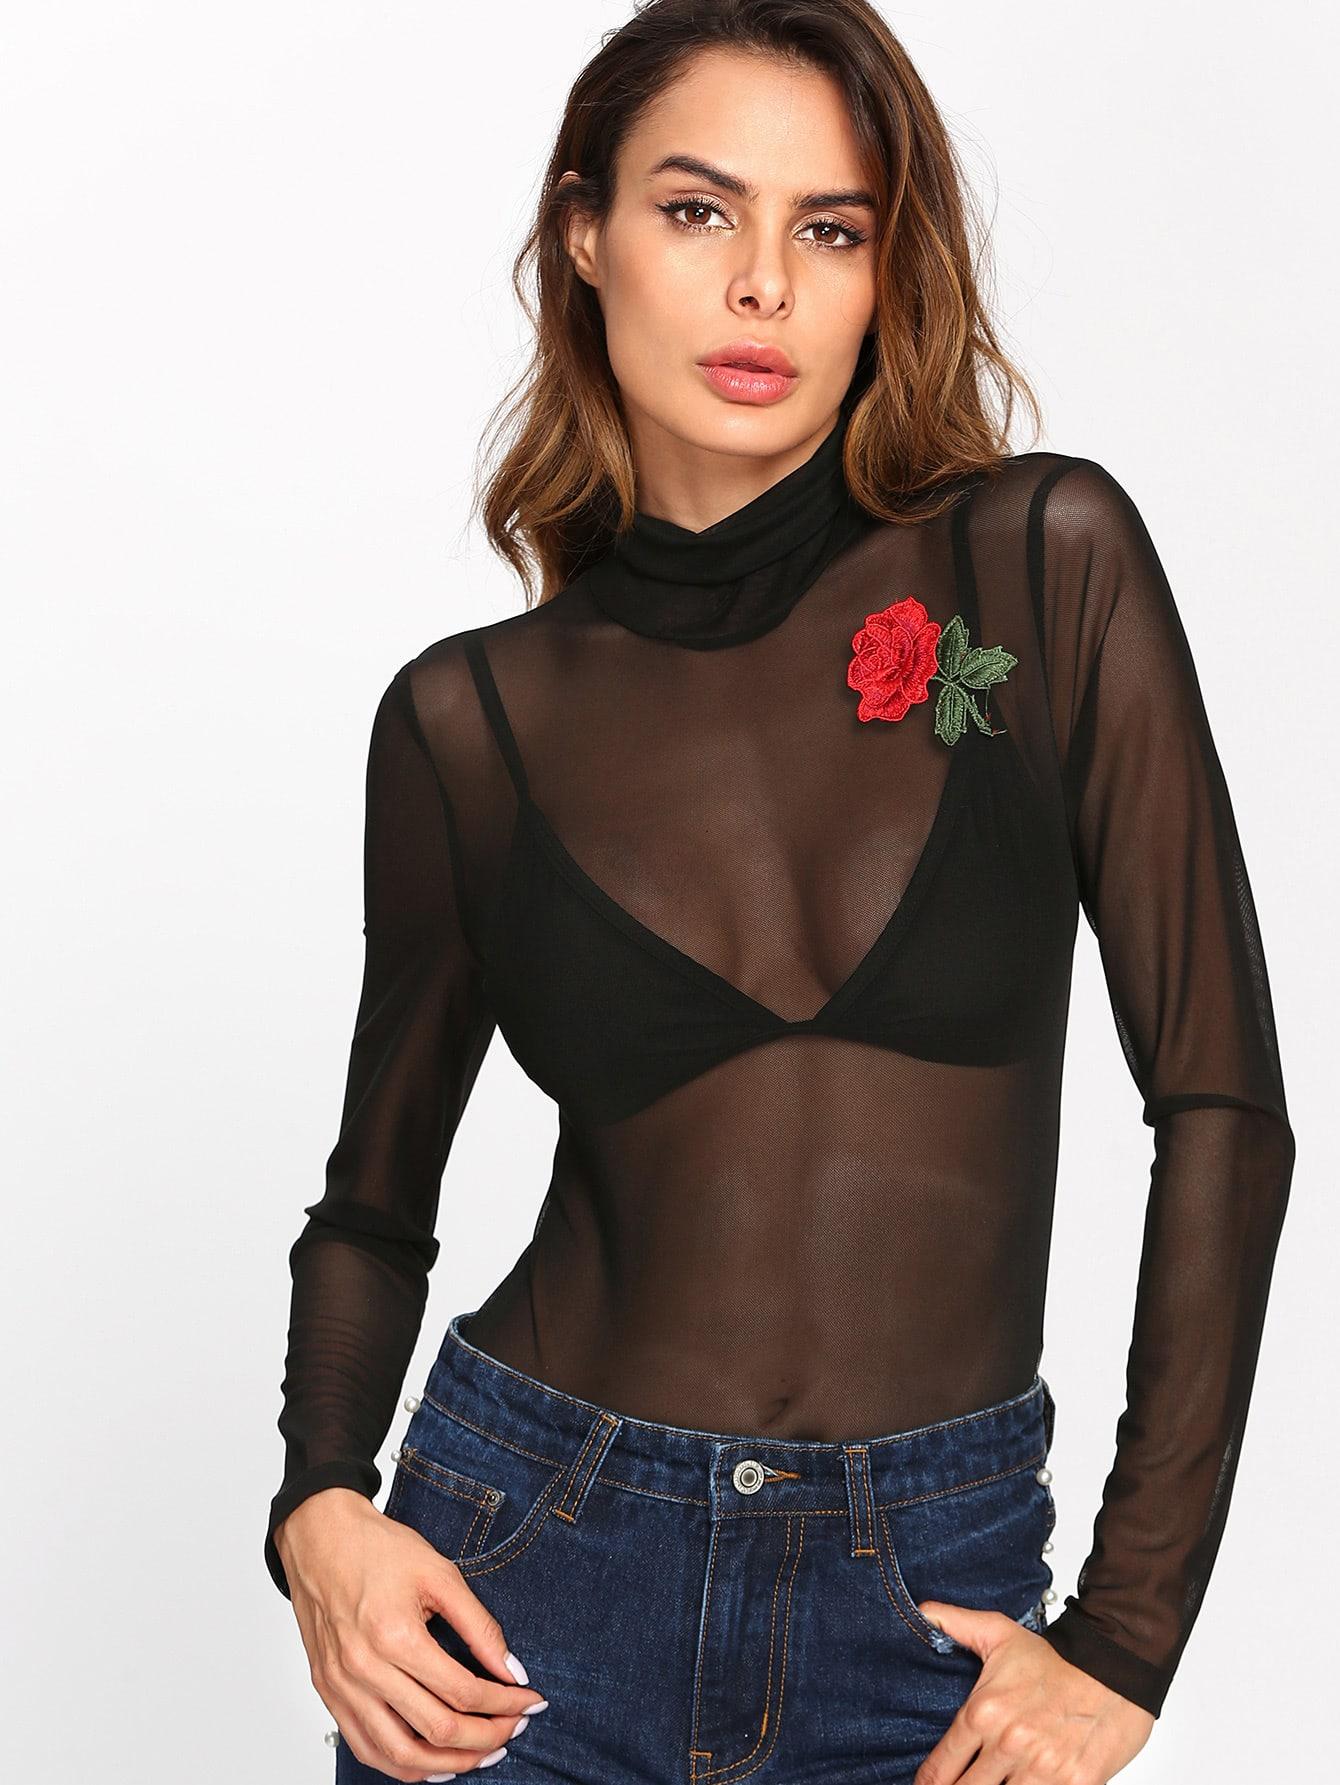 цена Embroidered Rose Applique Mesh Bodysuit онлайн в 2017 году